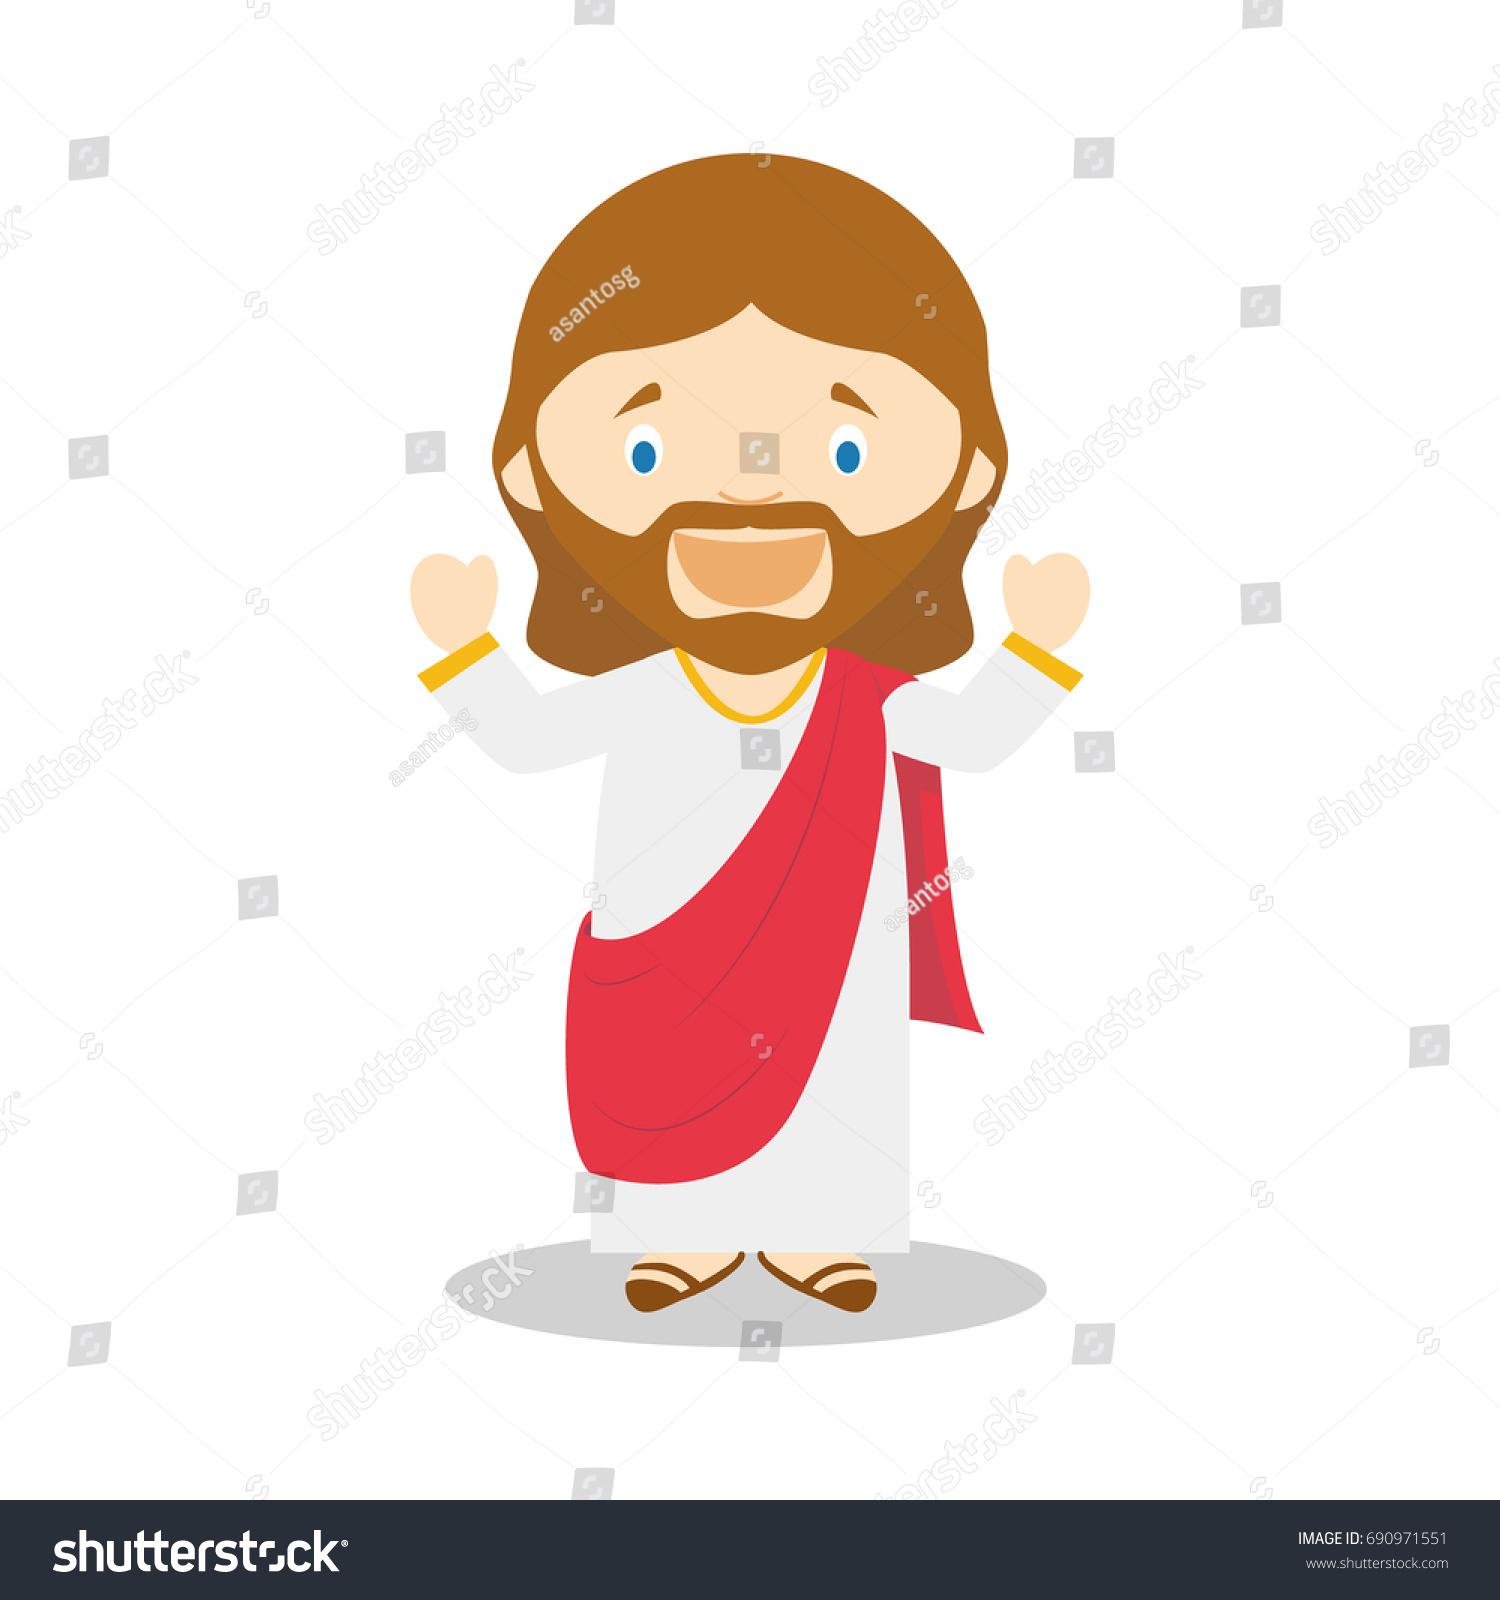 Cartoon Characters Using Shapes : Jesus nazareth cartoon character vector illustration stock